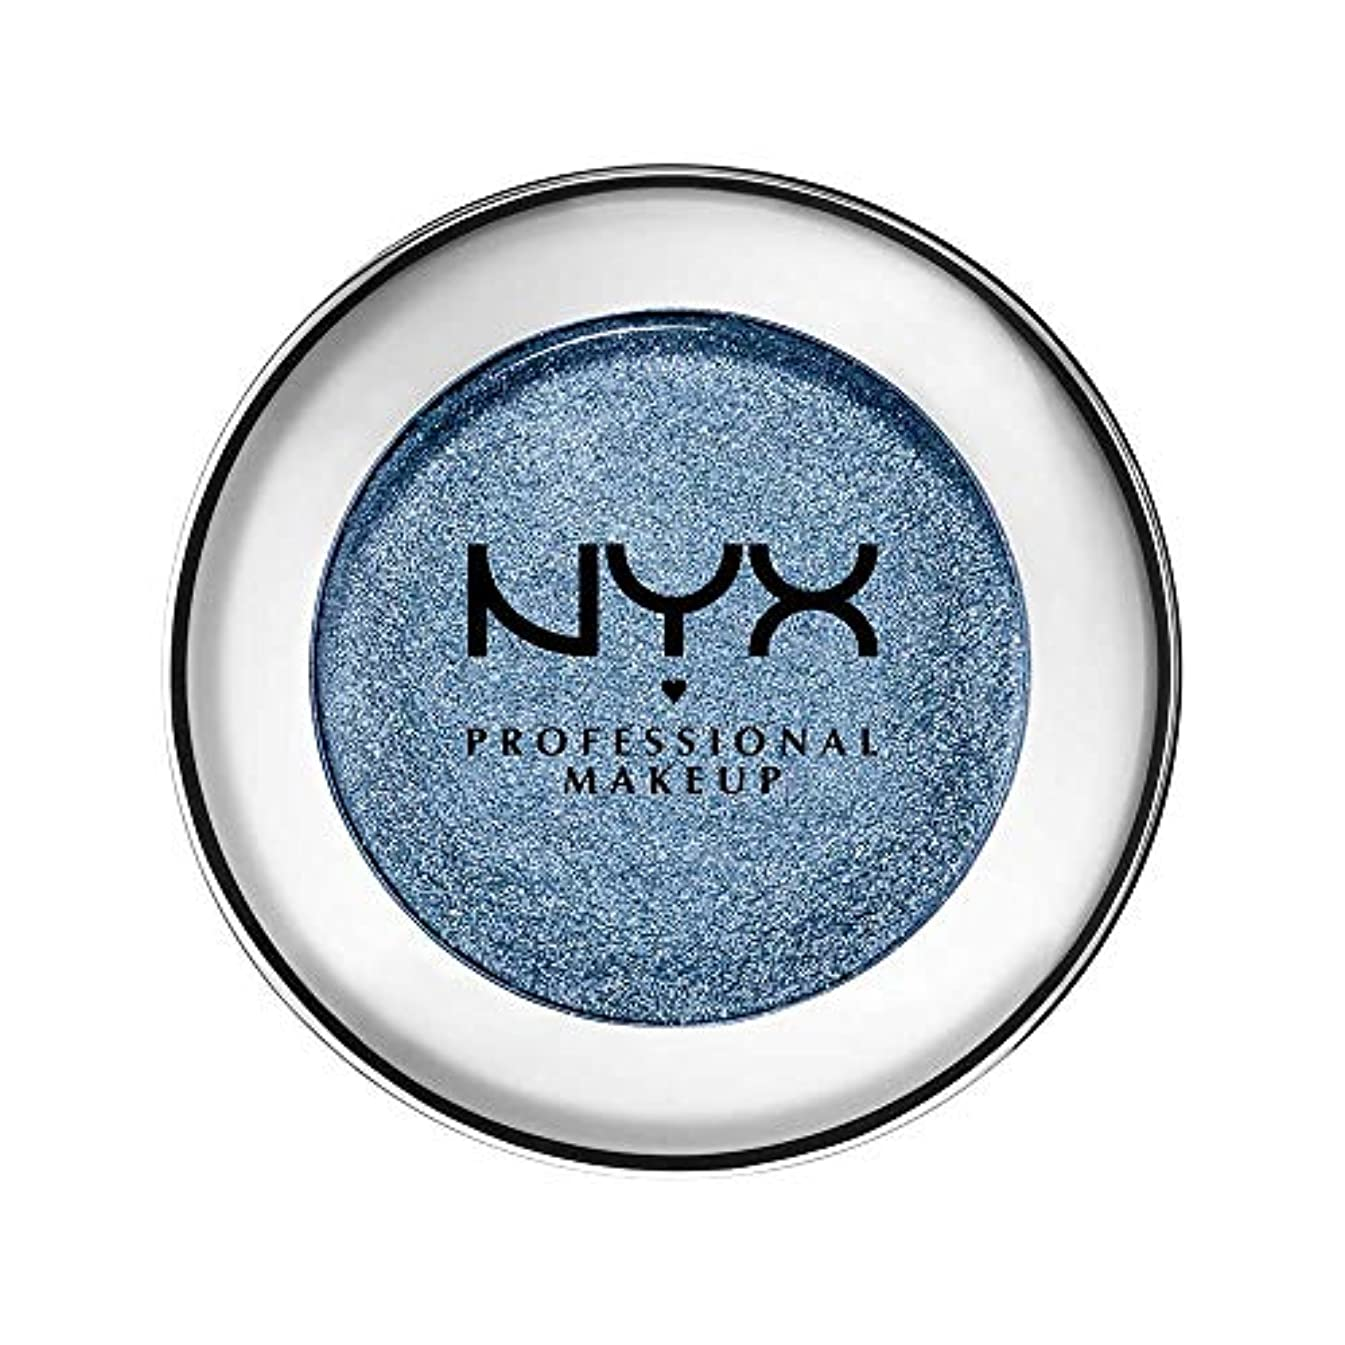 NYX(ニックス) プリズマ シャドウ 08 カラーブルー ジーンズ